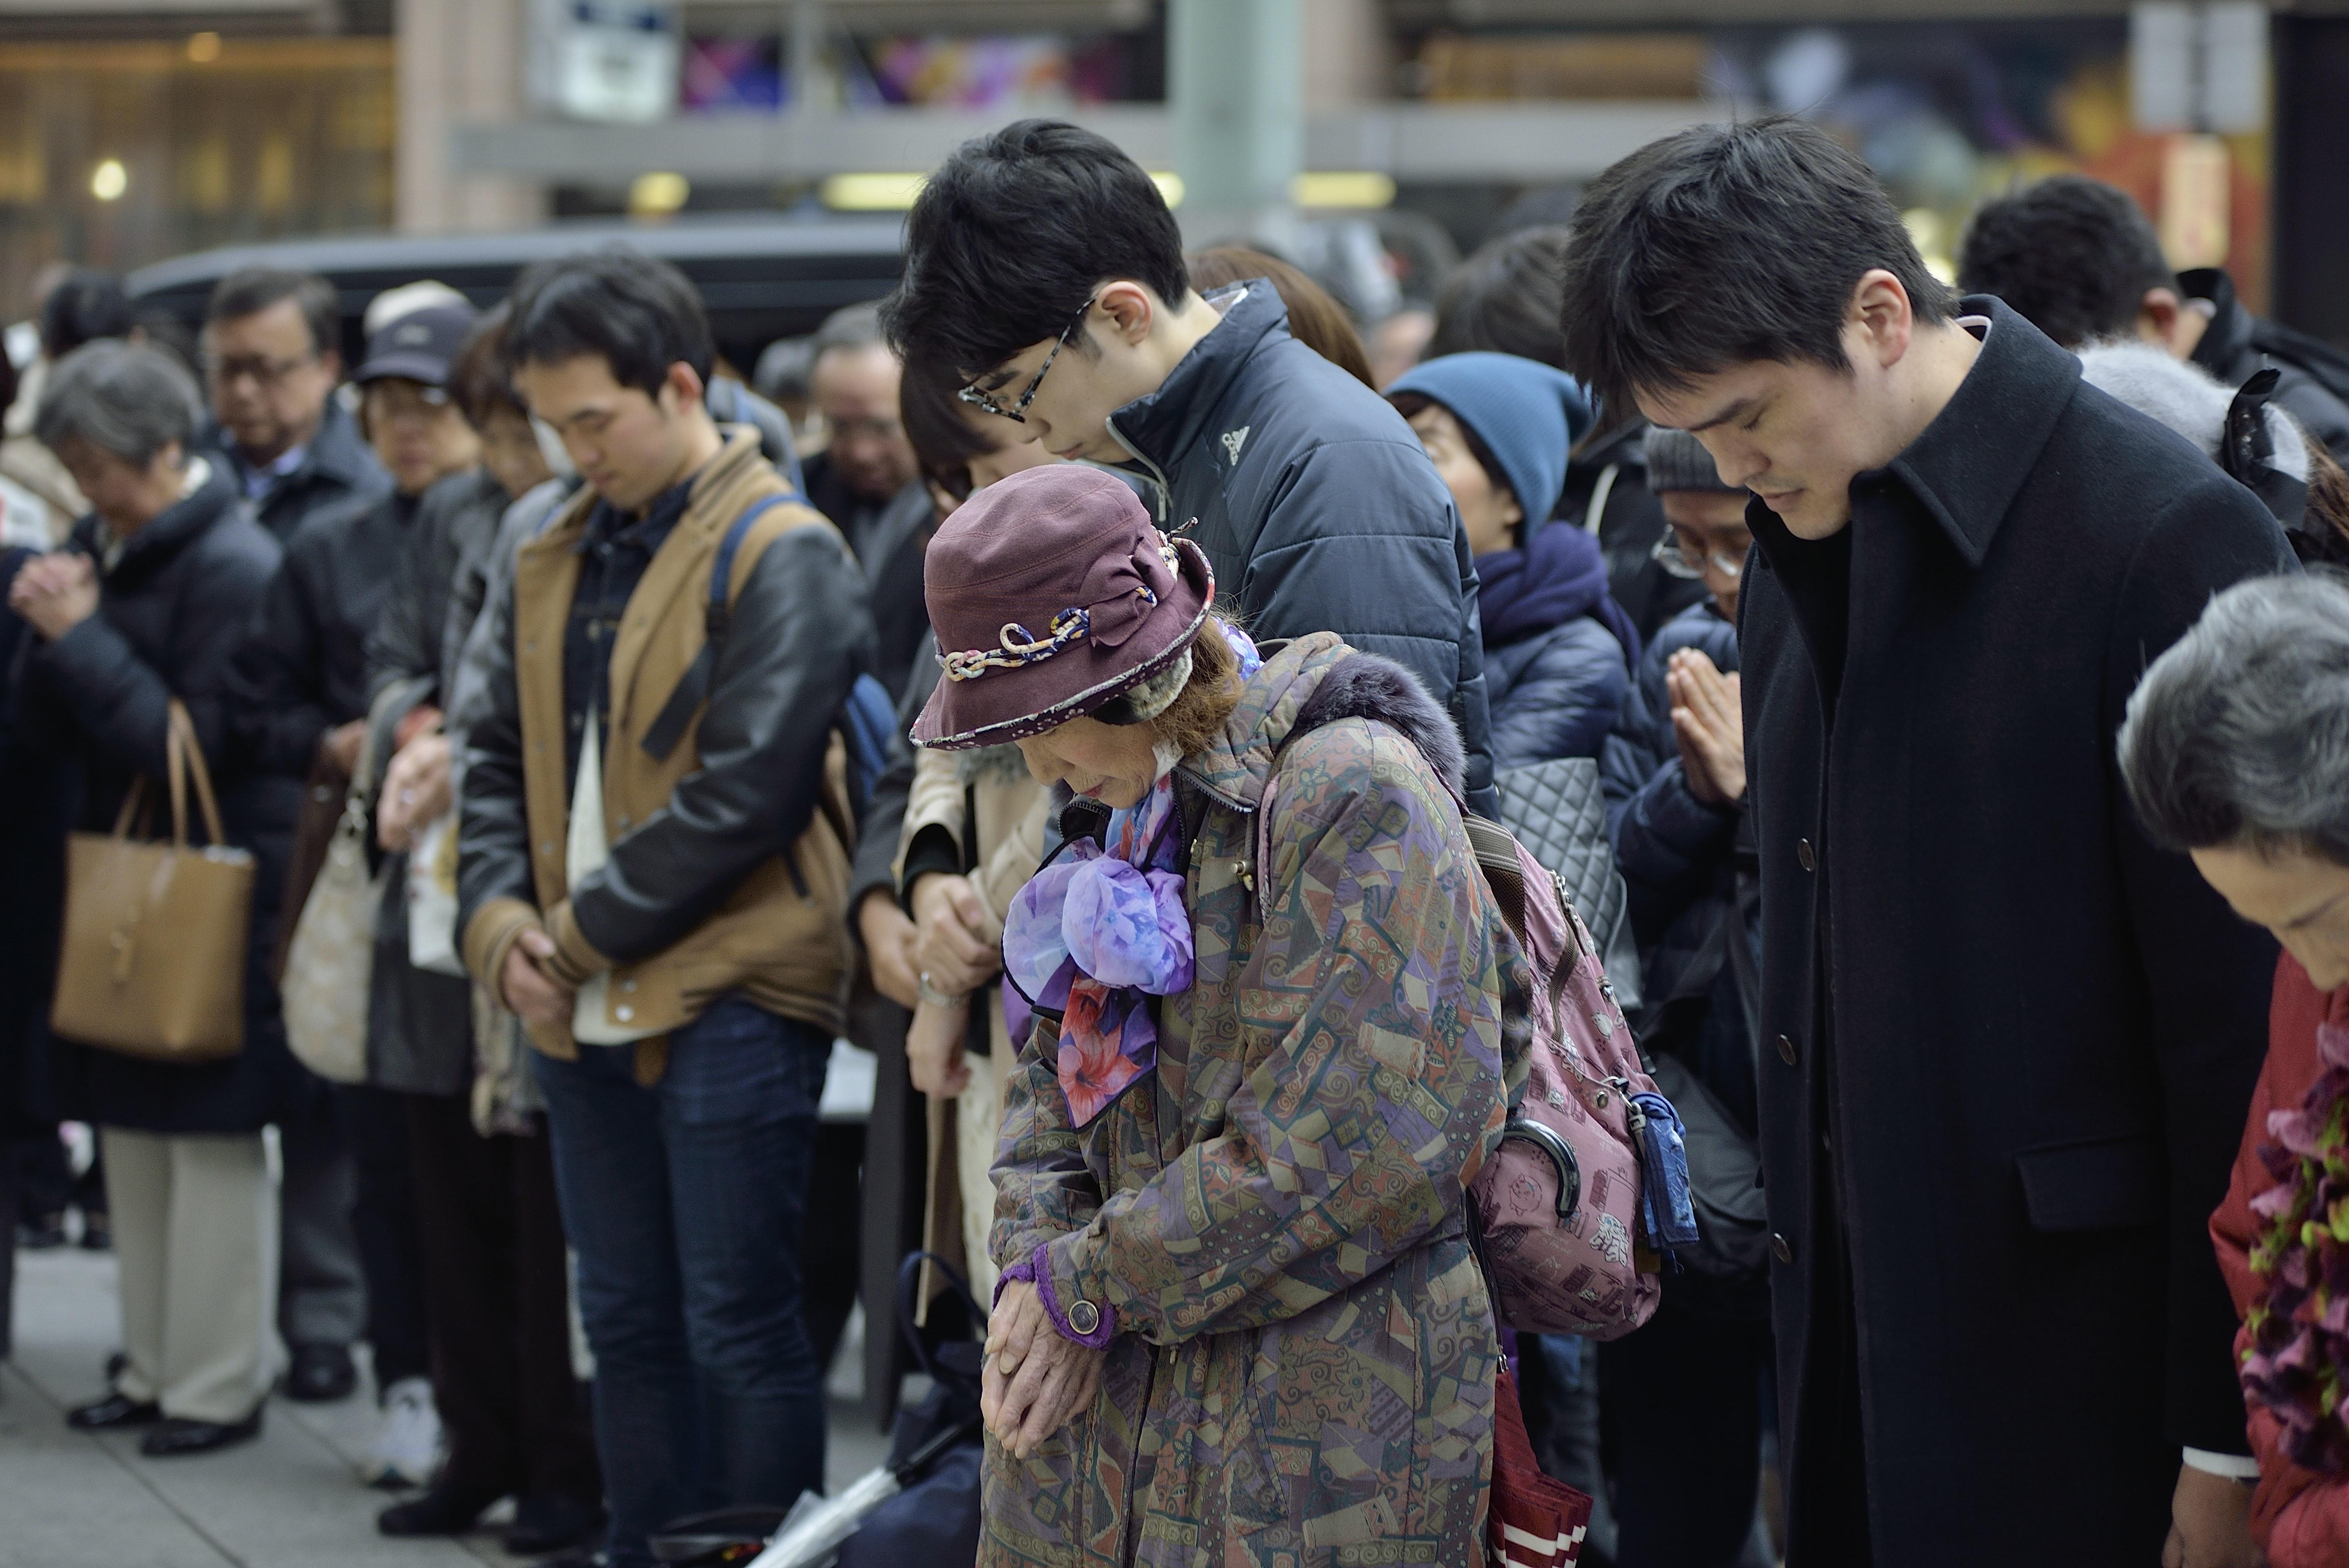 Japan commemorates the 5th anniversary of Great Tohoku Earthquake